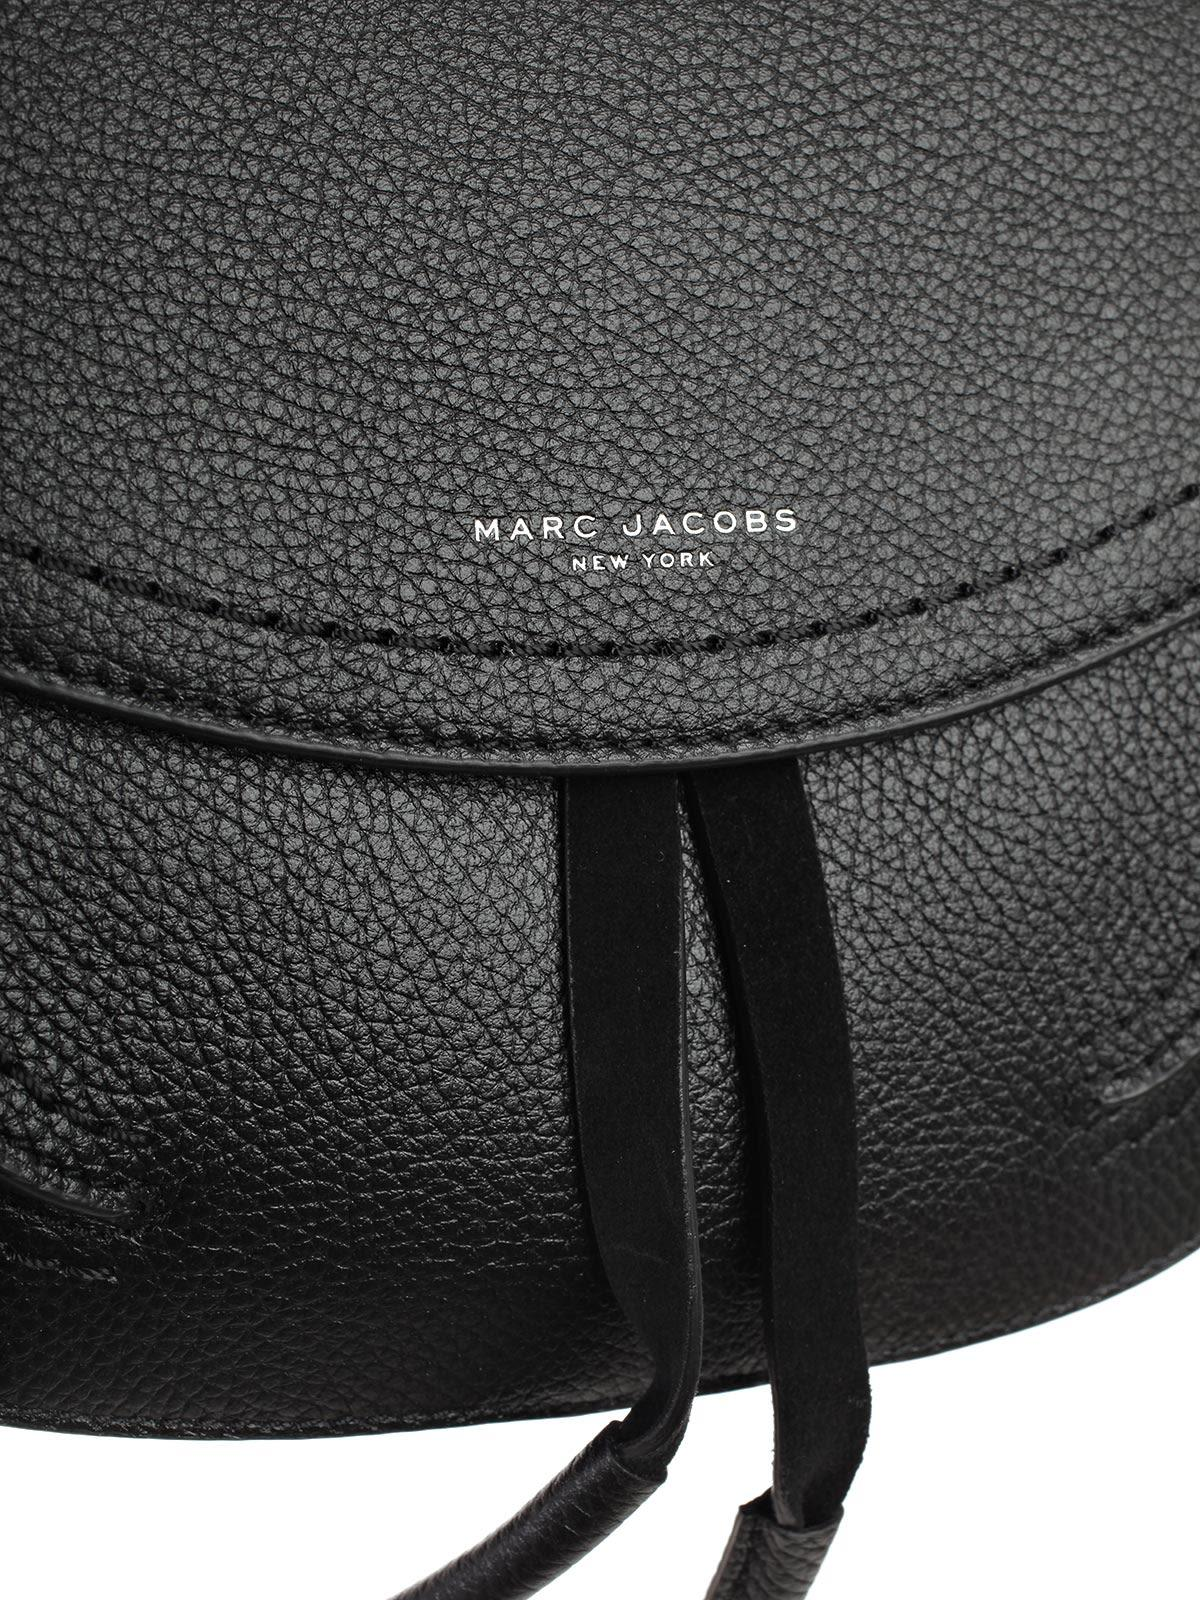 Marc Jacobs Bag In Black